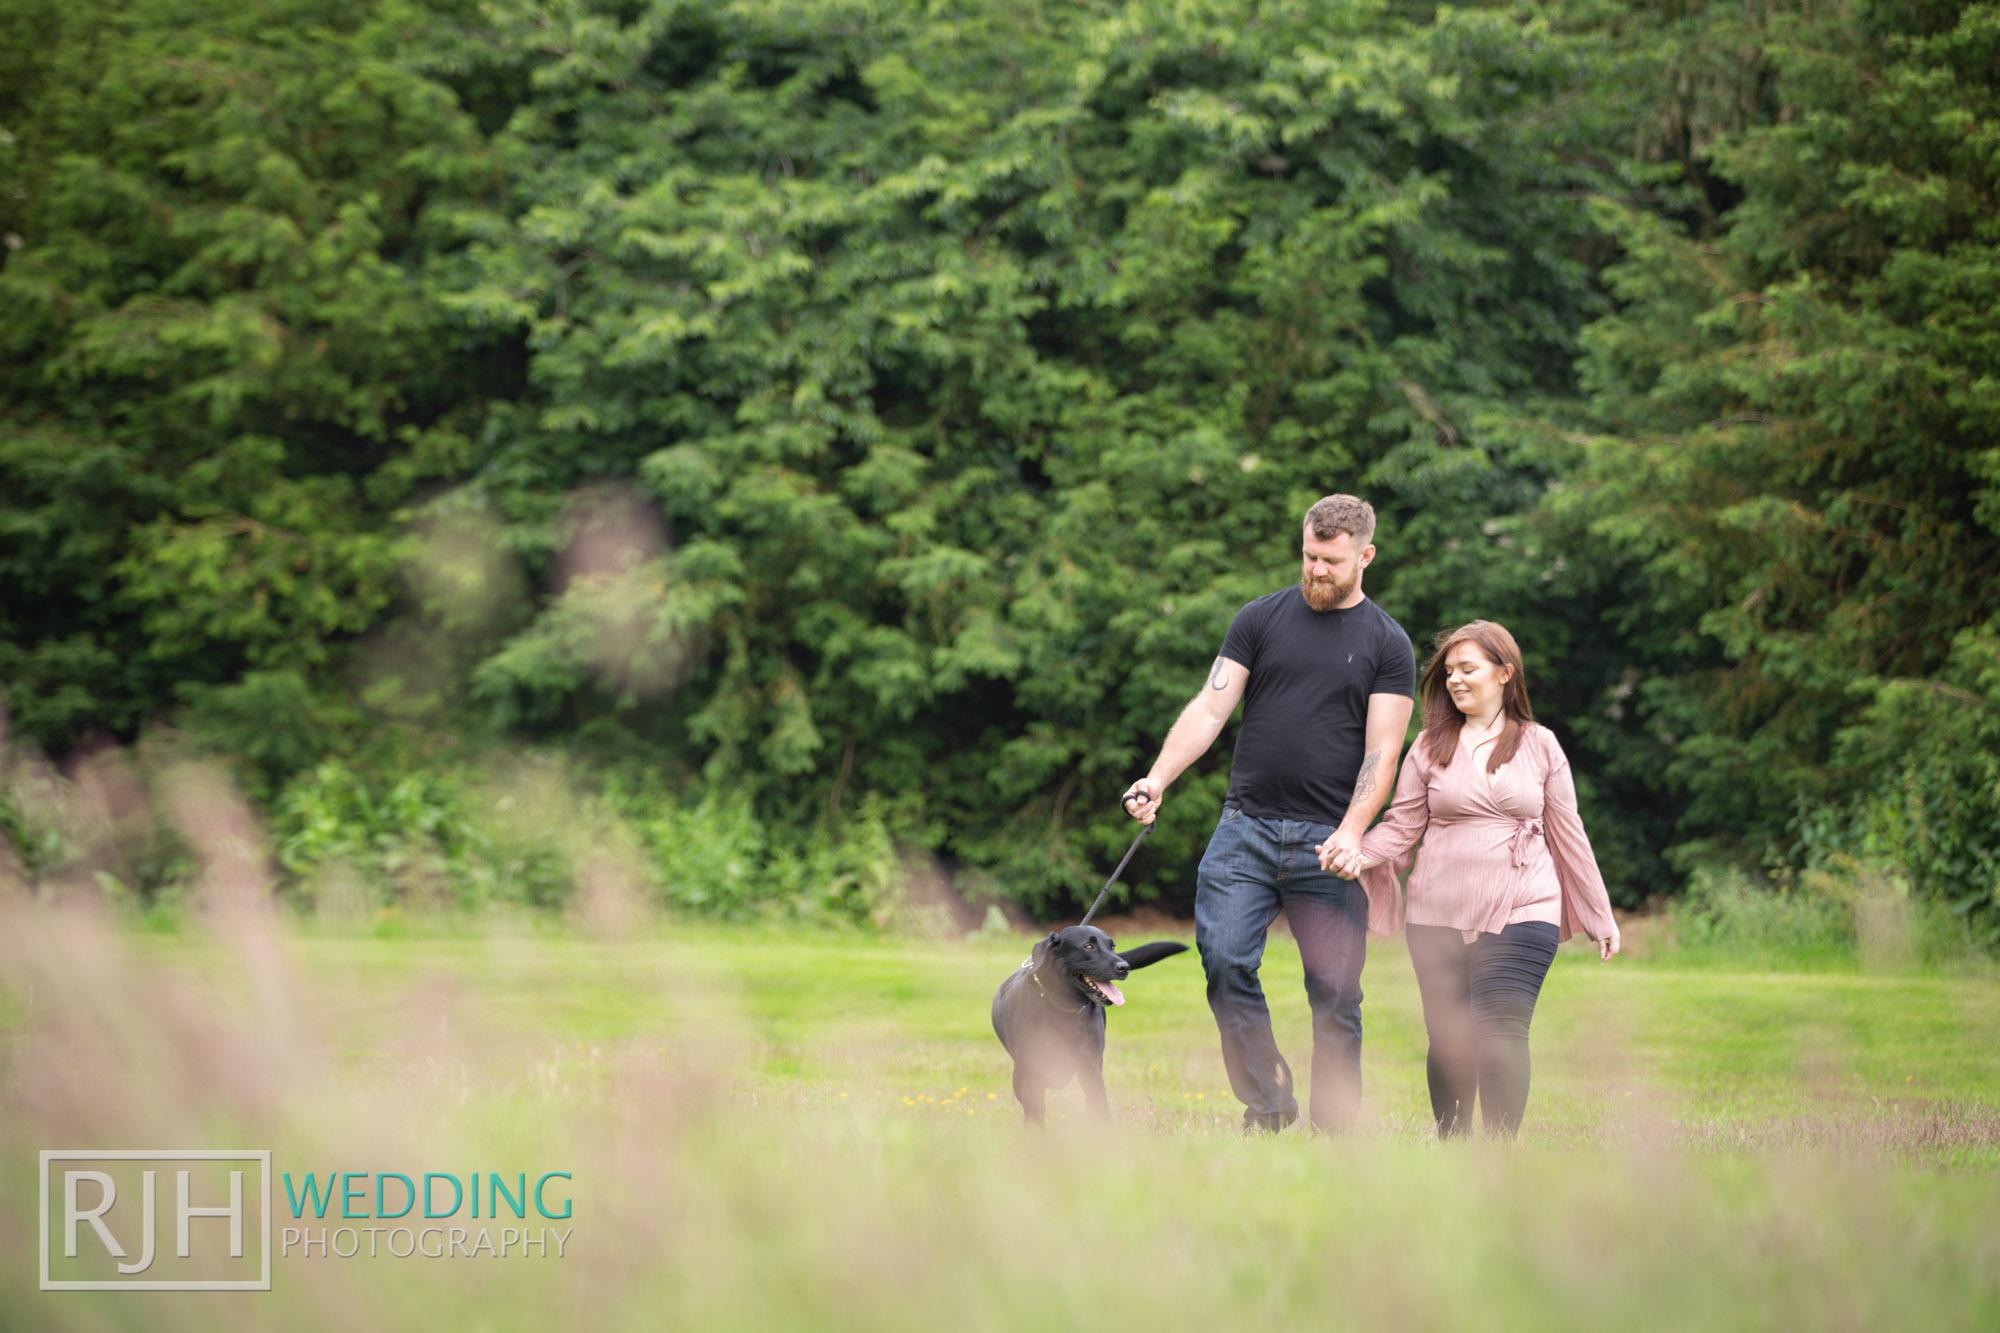 Osmaston Park Wedding Photographer - Jodie & Oli_003_IMG_7428.jpg